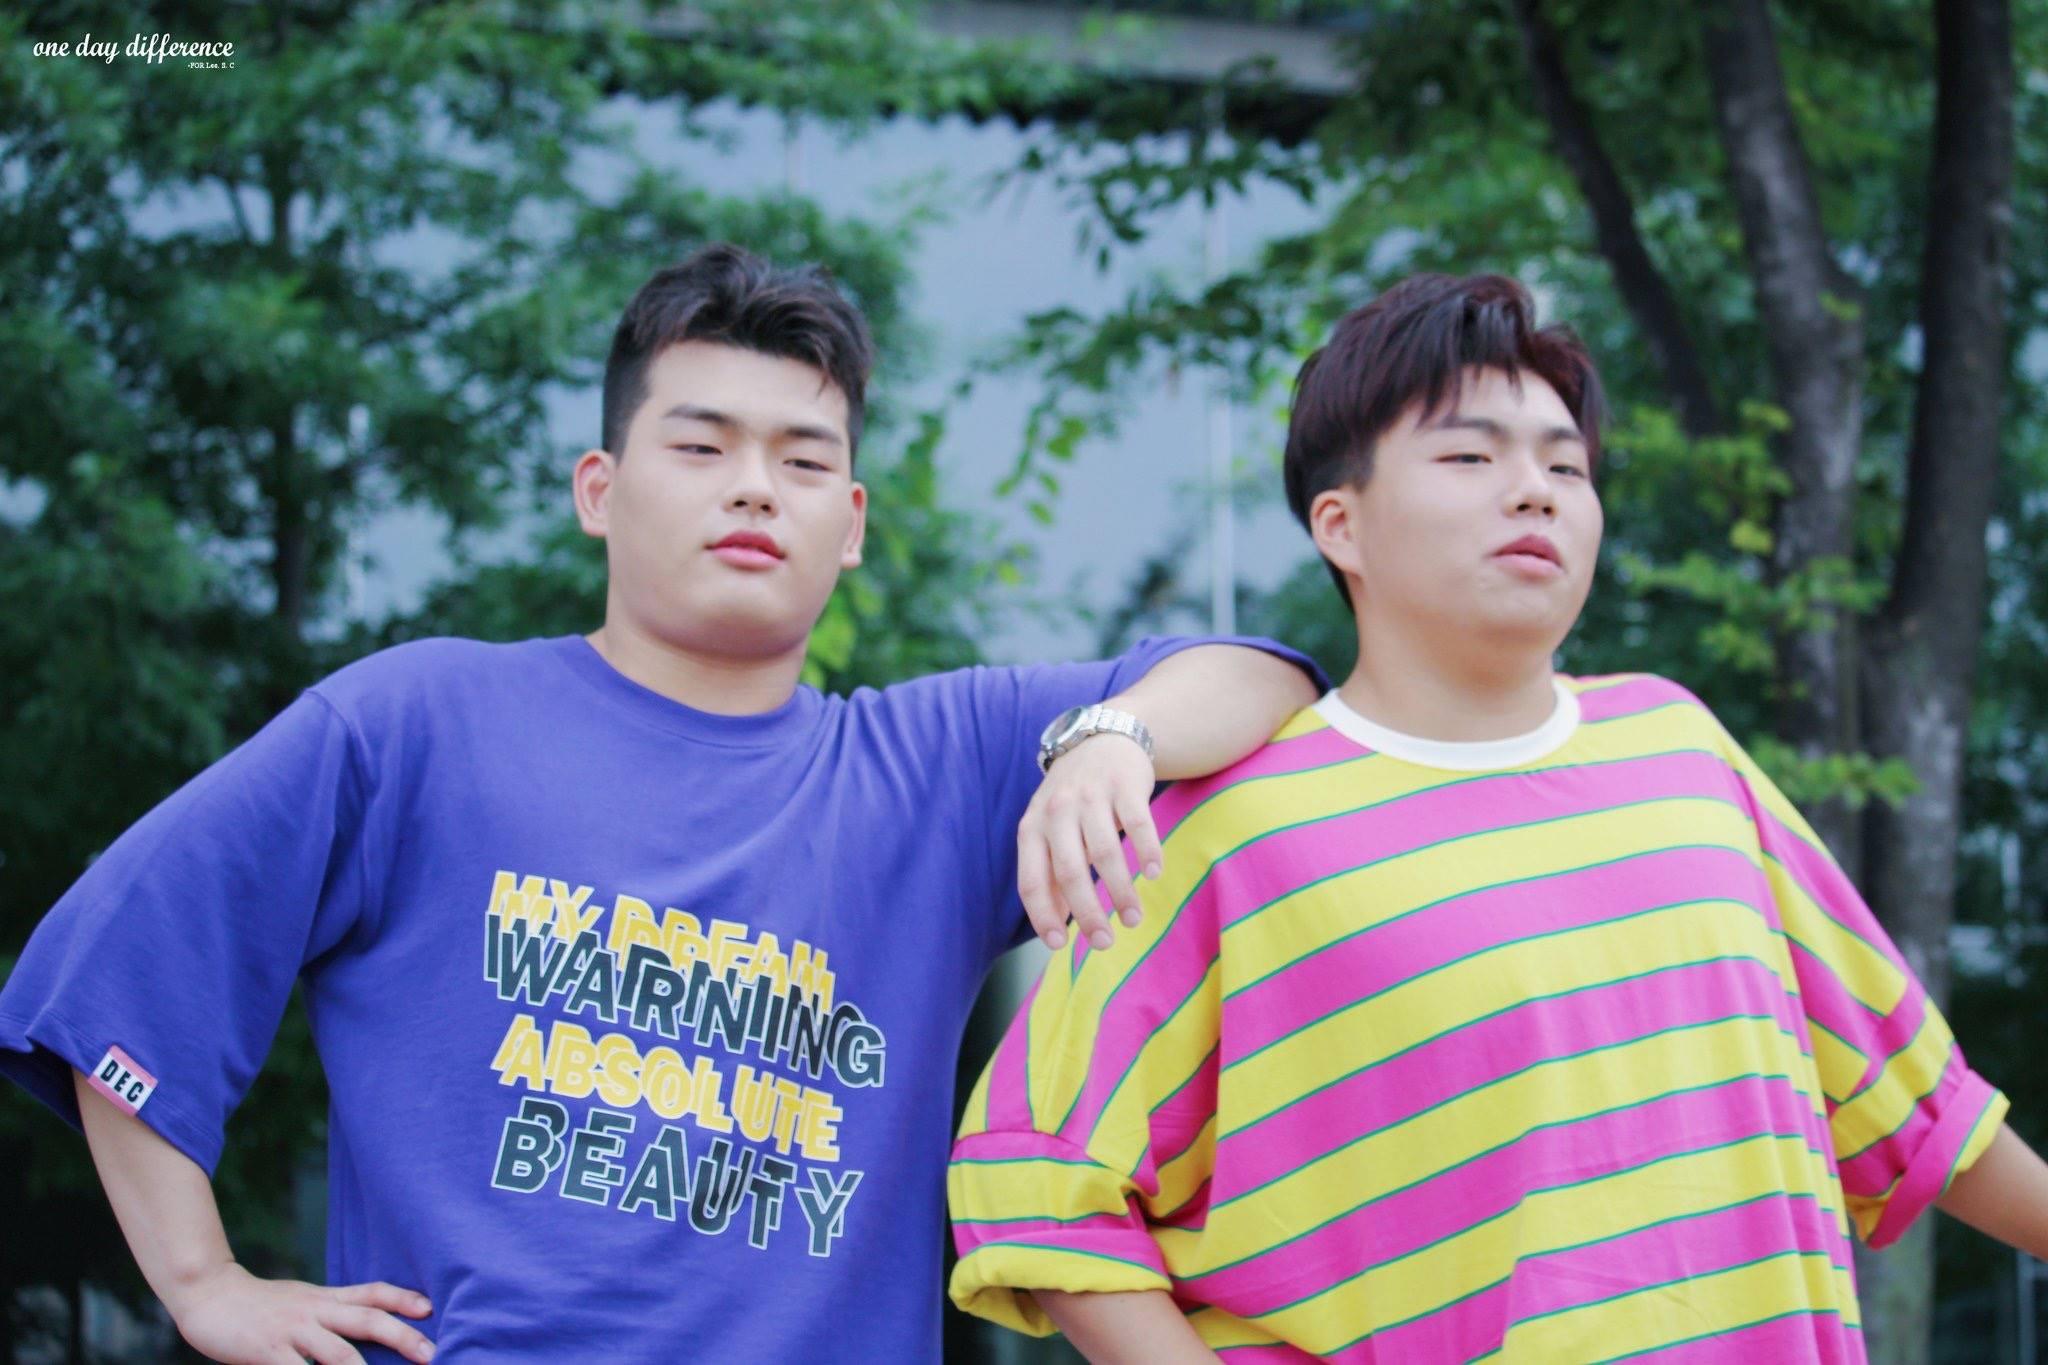 theeastlight, seokchul, seunghyun, theeastlight profile, theeastlight members